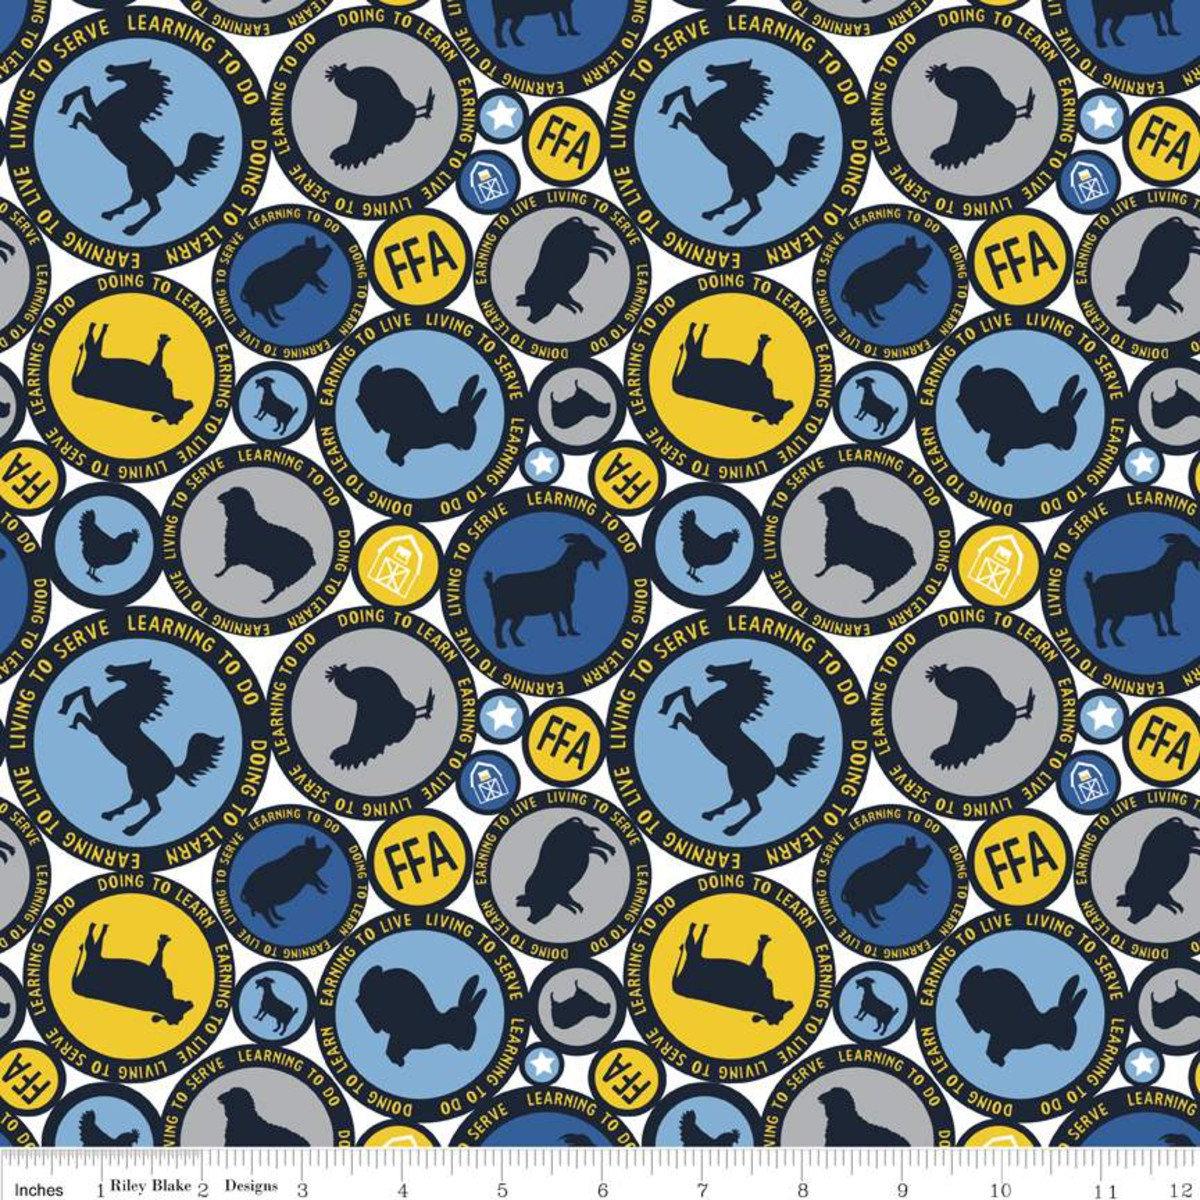 FFA Forever Blue Circle White Fabric By Riley Blake